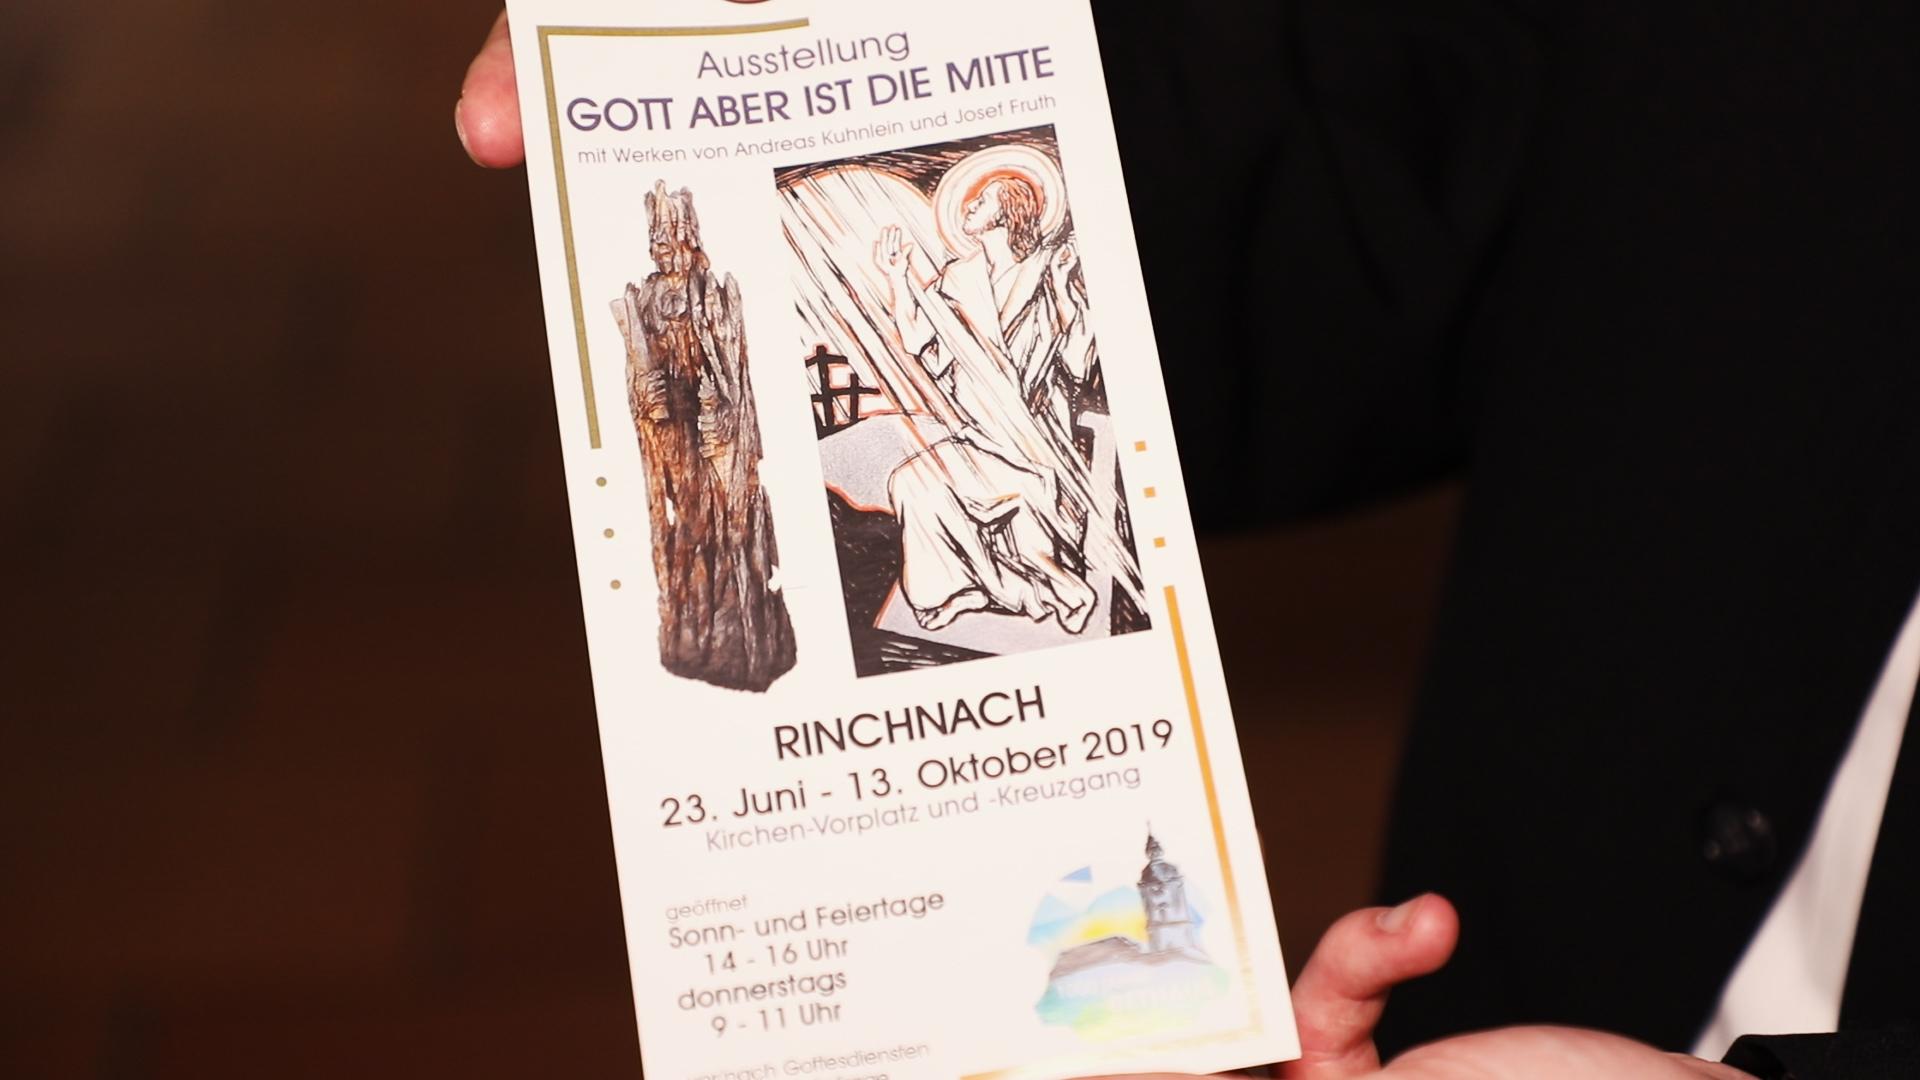 190808_1000-Jahre-Rinchnach_Ausstellung_thumb6